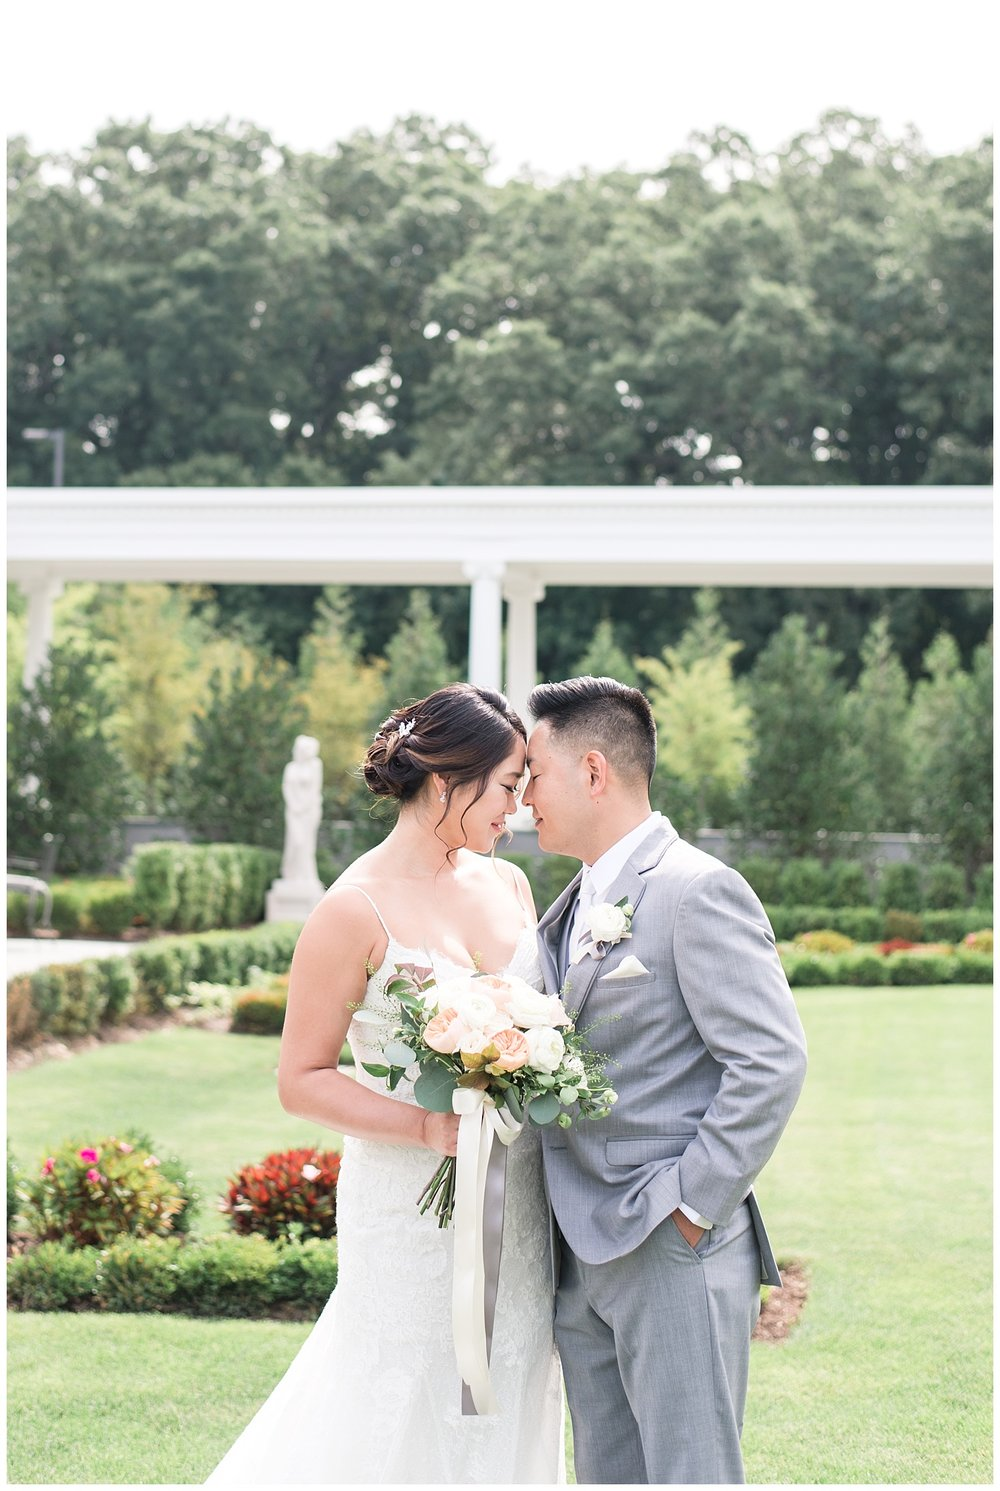 park-chateau-wedding-fabiana-skubic-photography (29).jpg